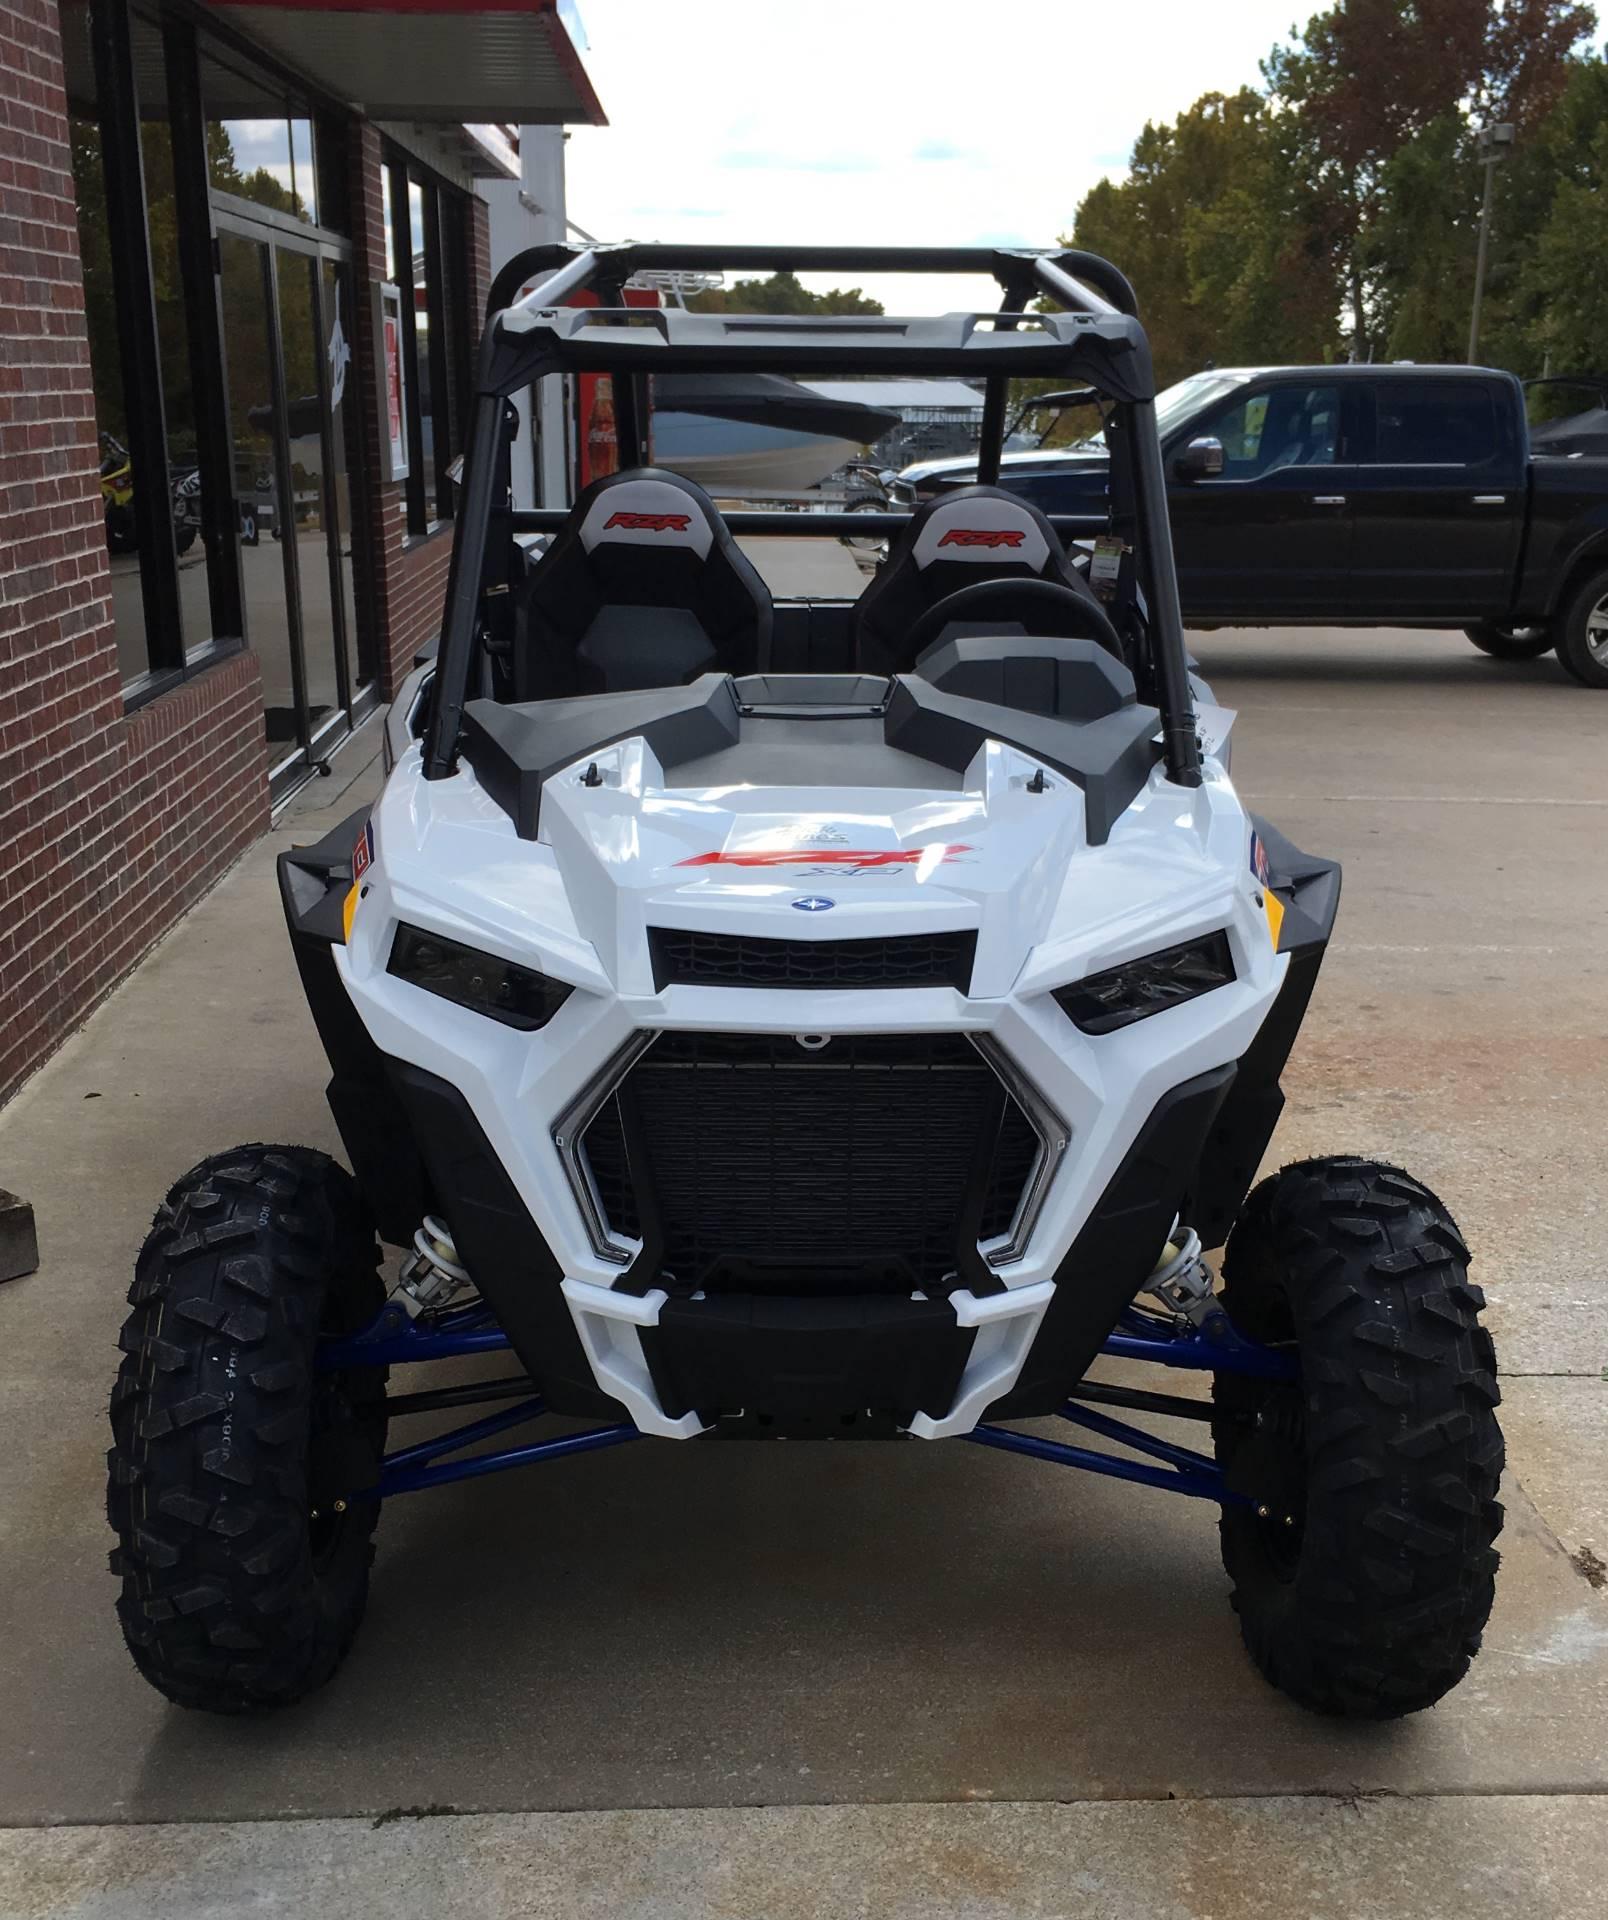 2019 Polaris RZR XP Turbo LE 6